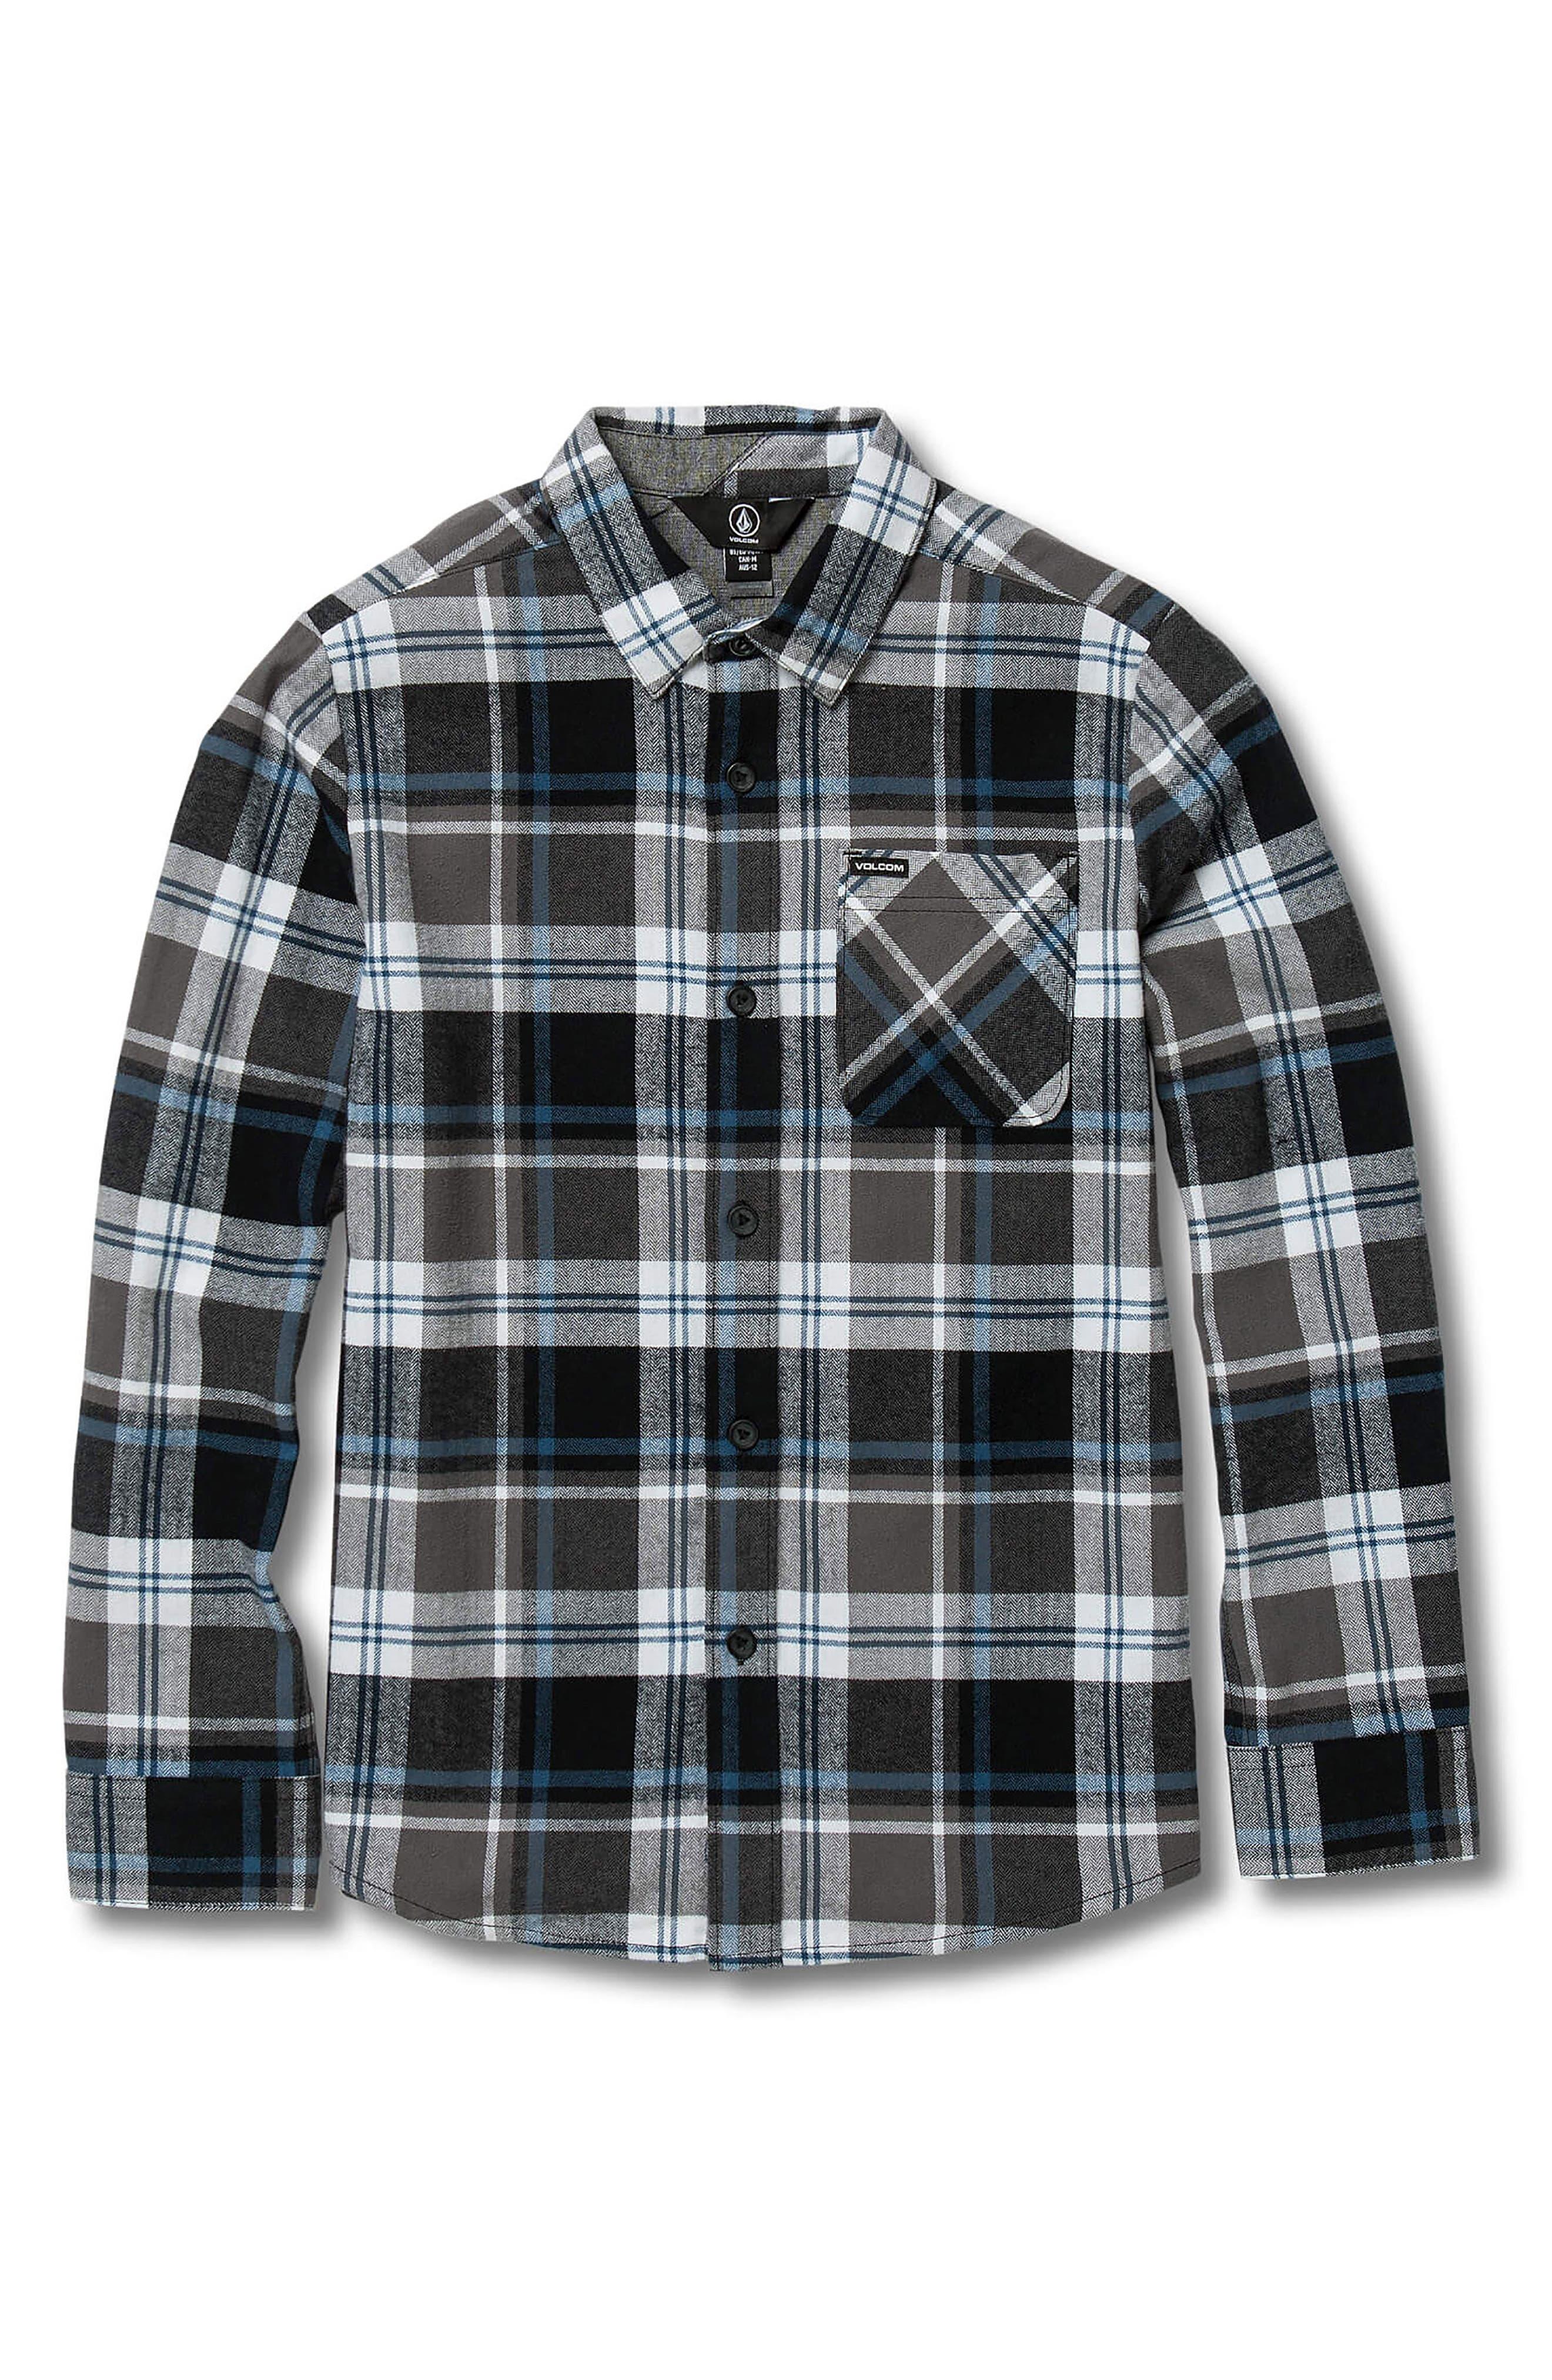 VOLCOM Caden Plaid Flannel Shirt, Main, color, PEWTER